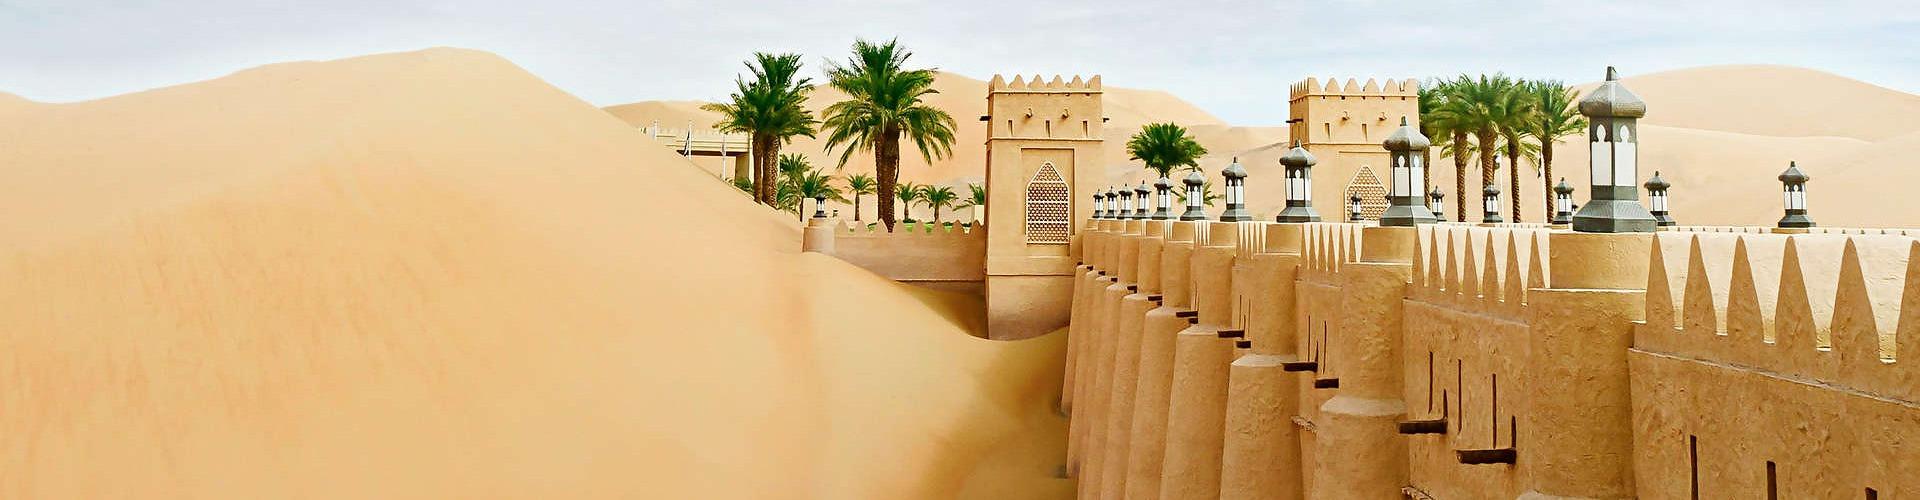 Arabskie Noce z Dubaju